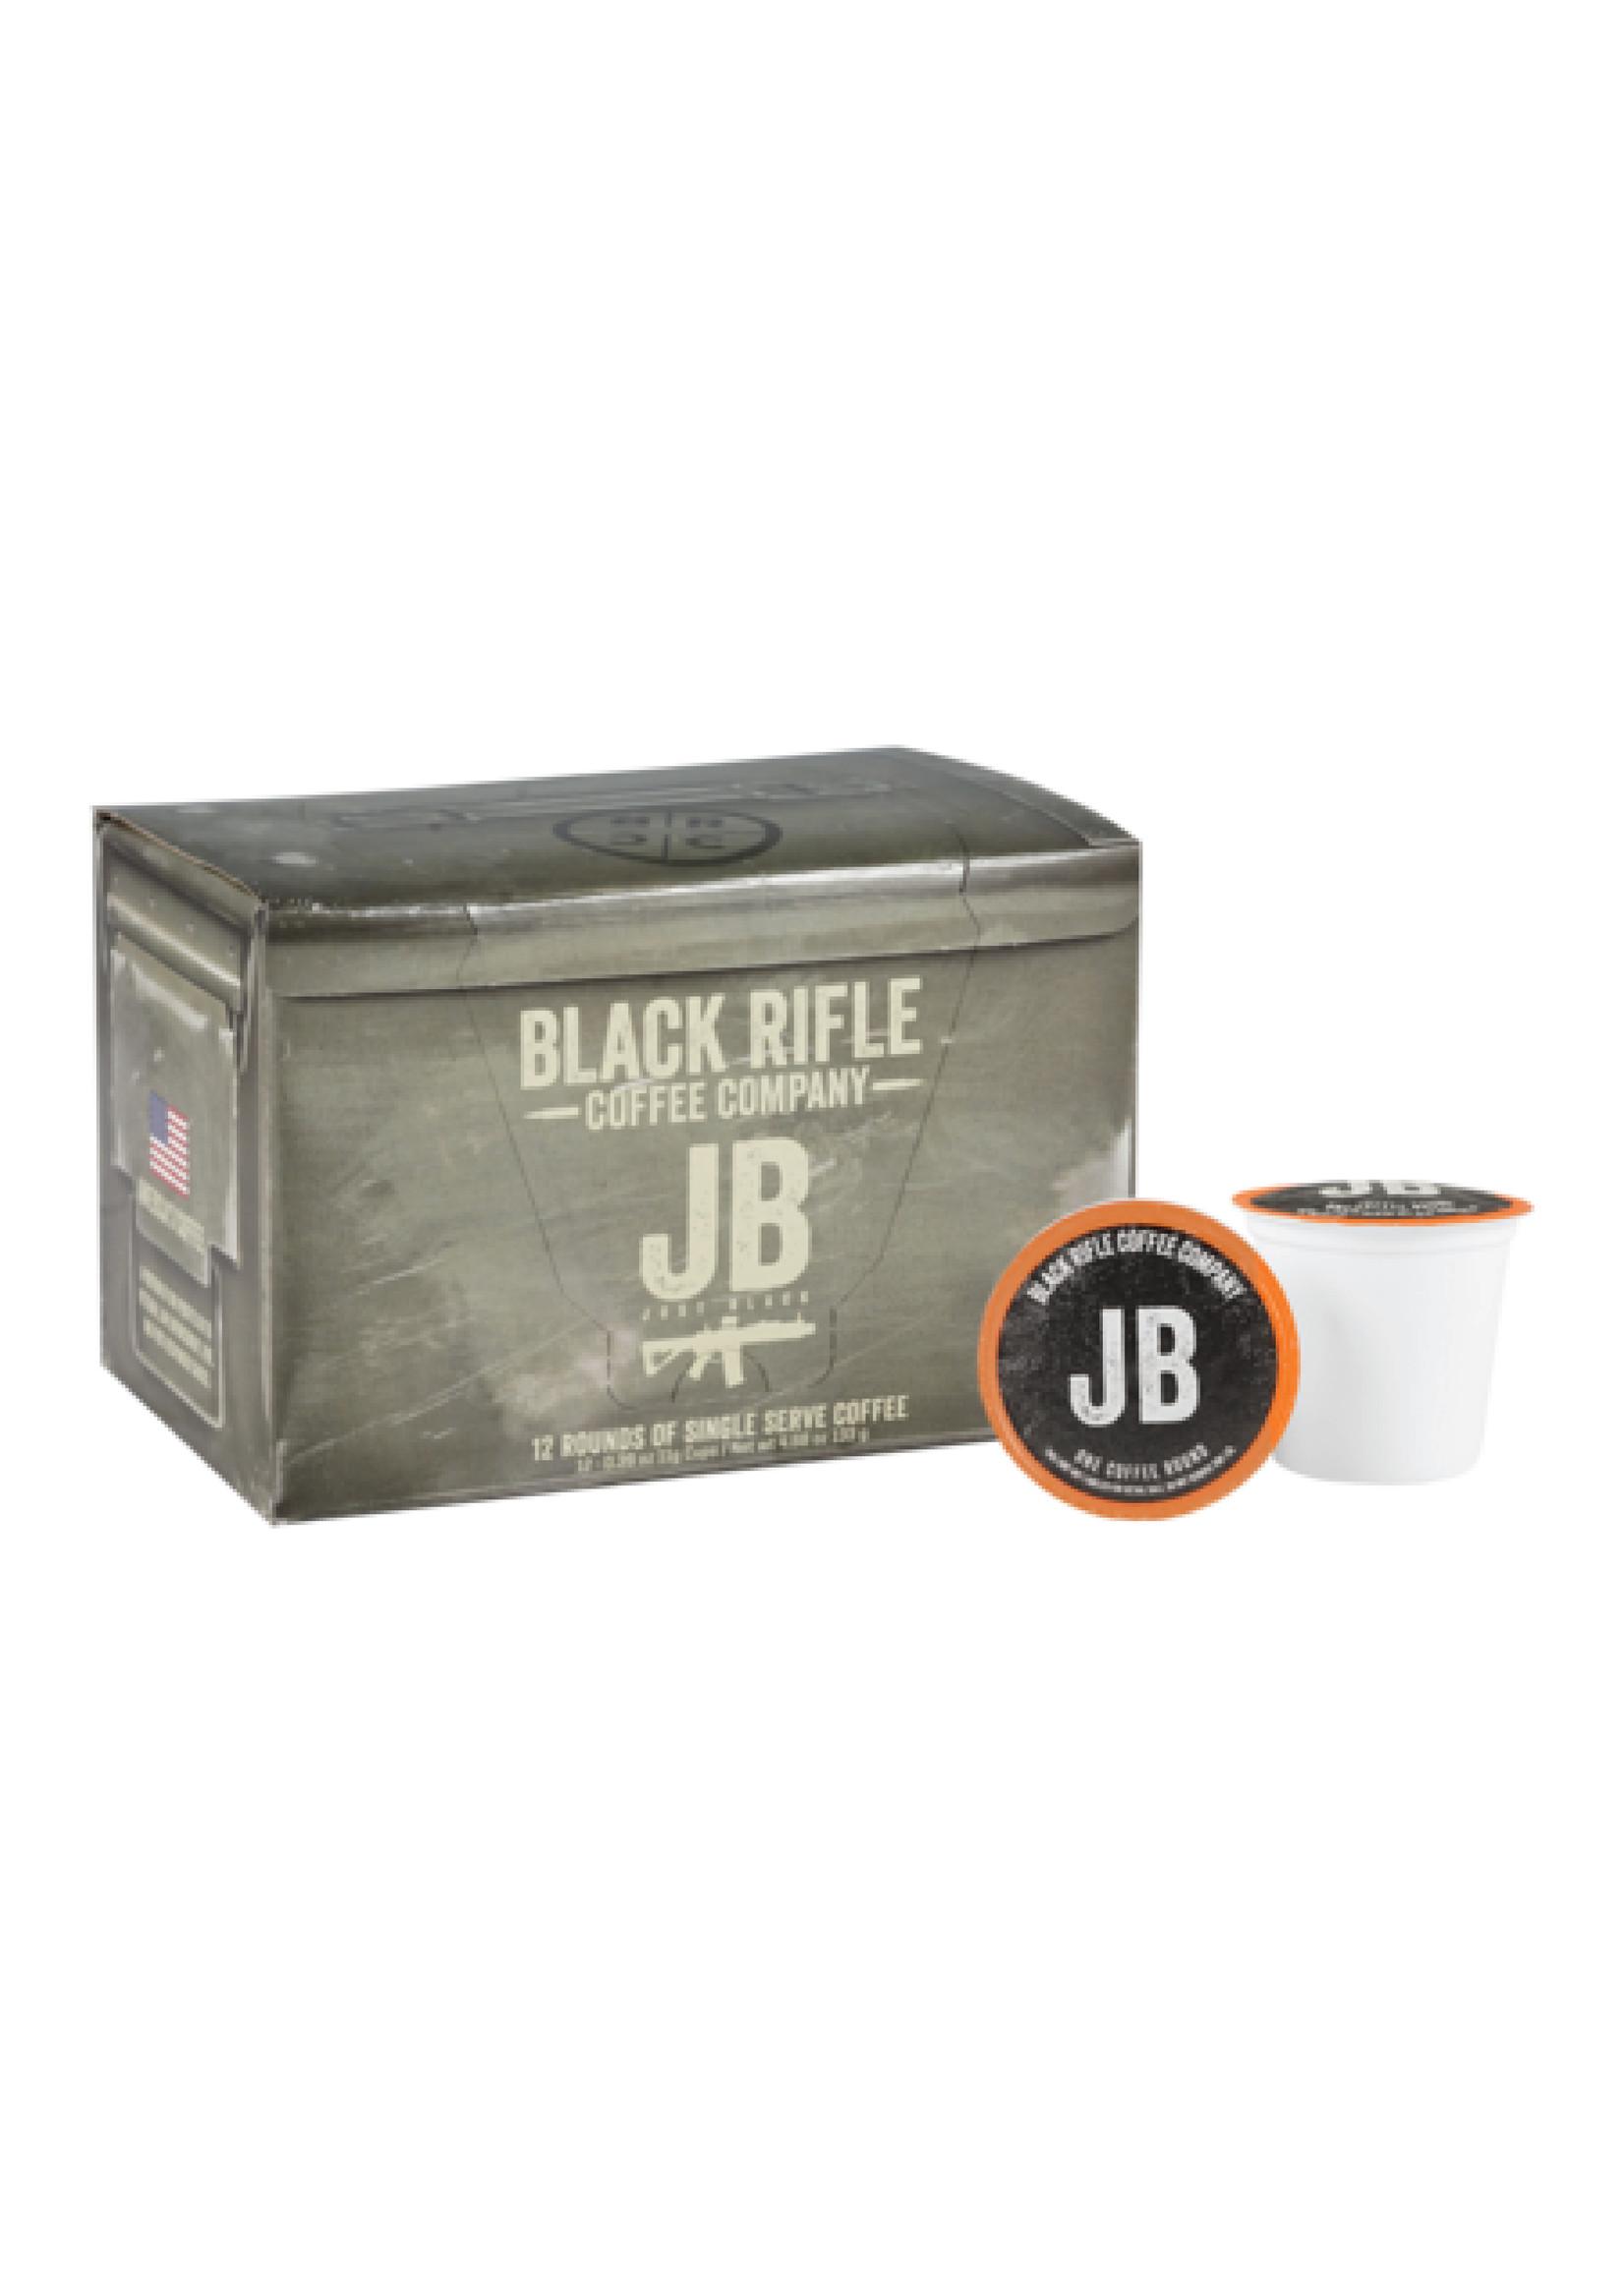 Black Rifle Coffee Company Black Rifle Coffee Company Just Black Coffee Rounds 12ct